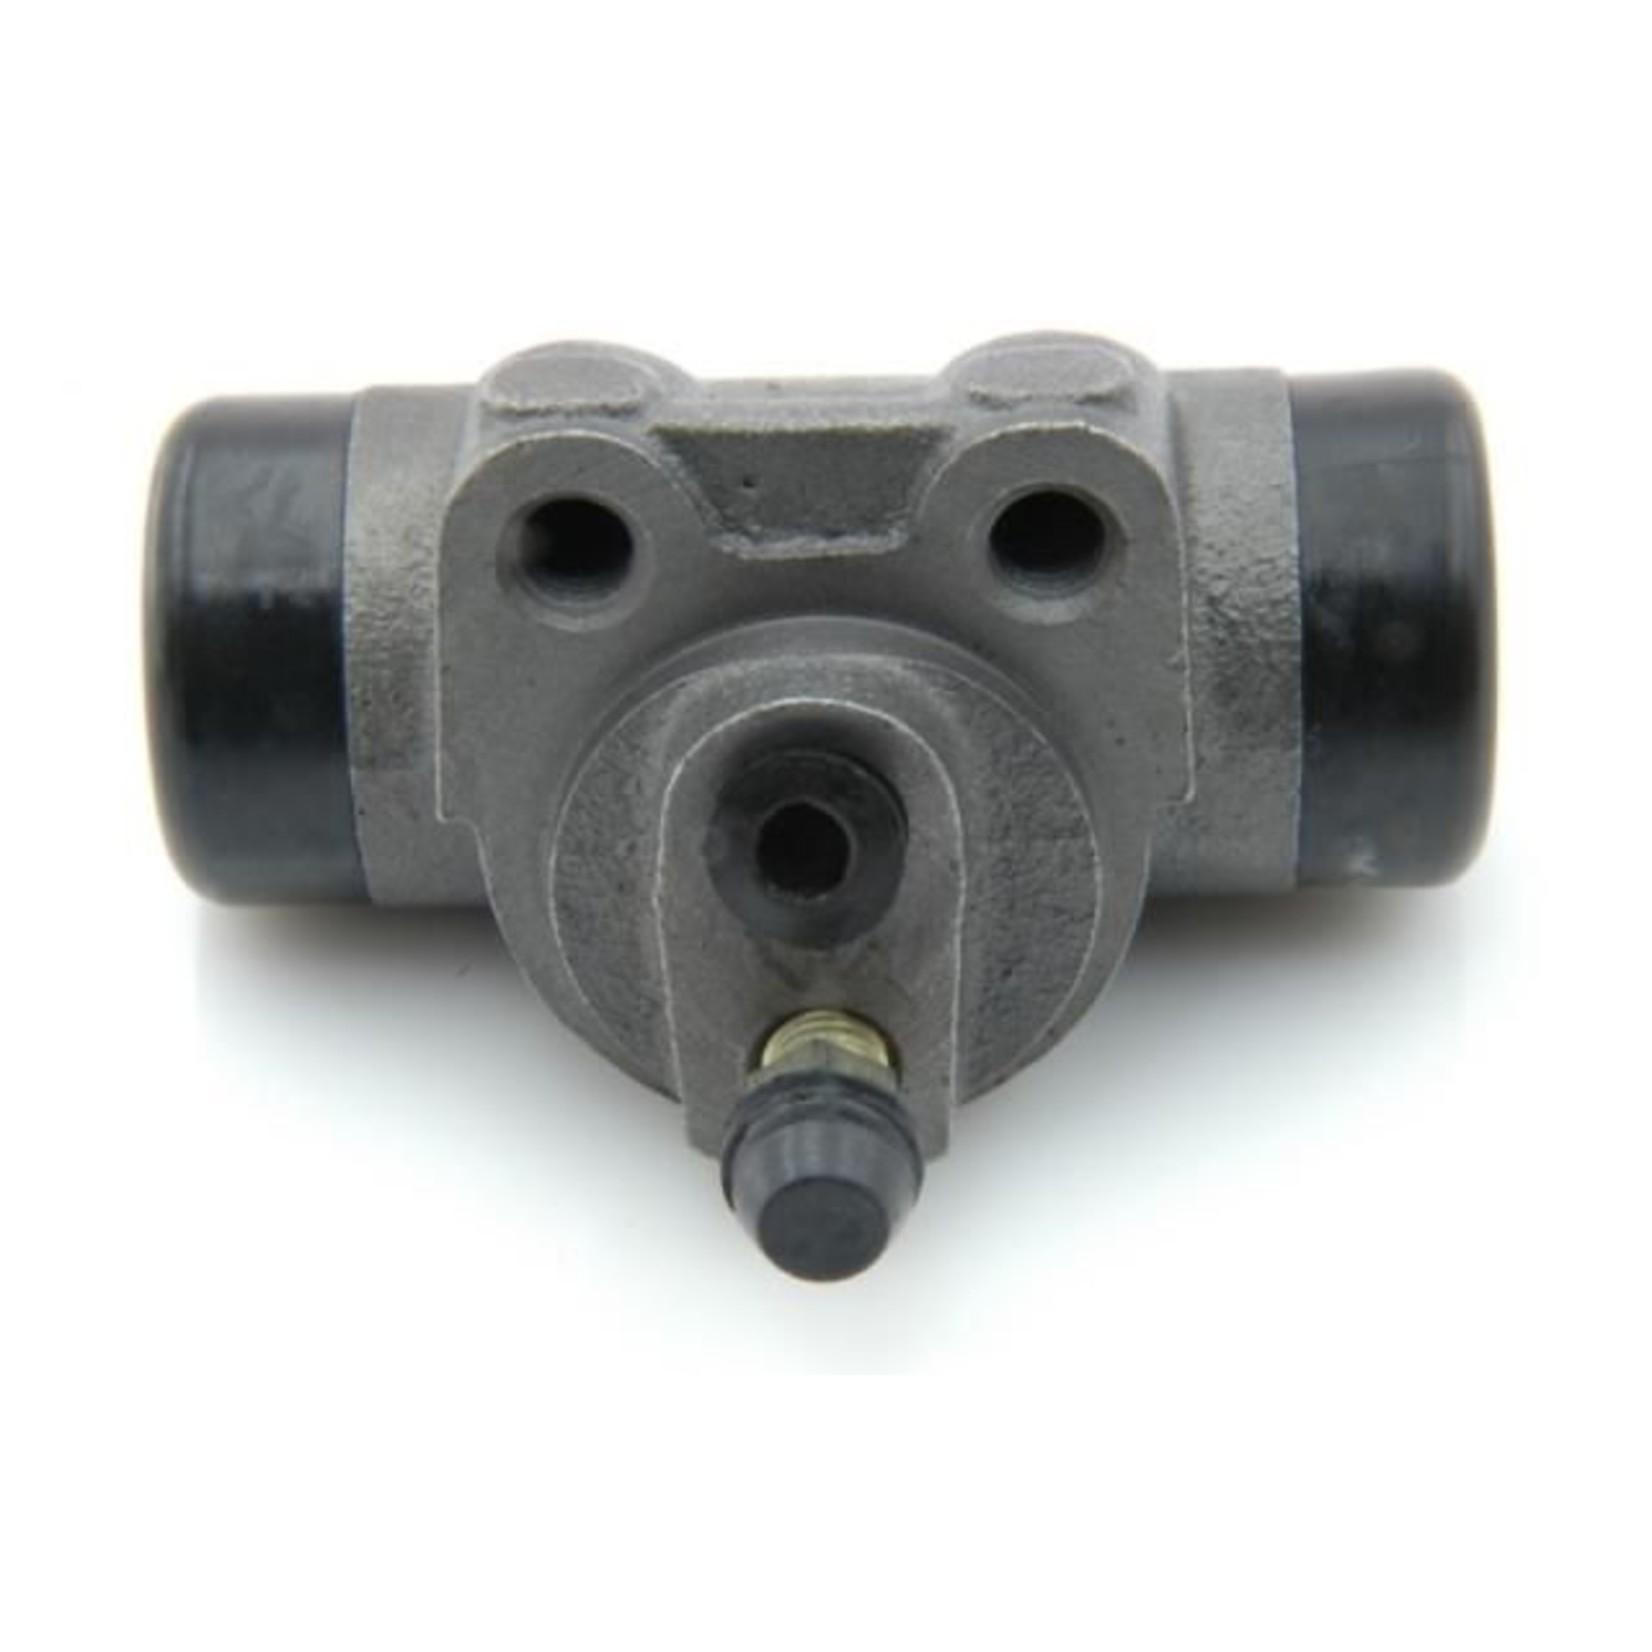 Cylindre de frein arrière break LHM & LHS Nr Org: DVN451016